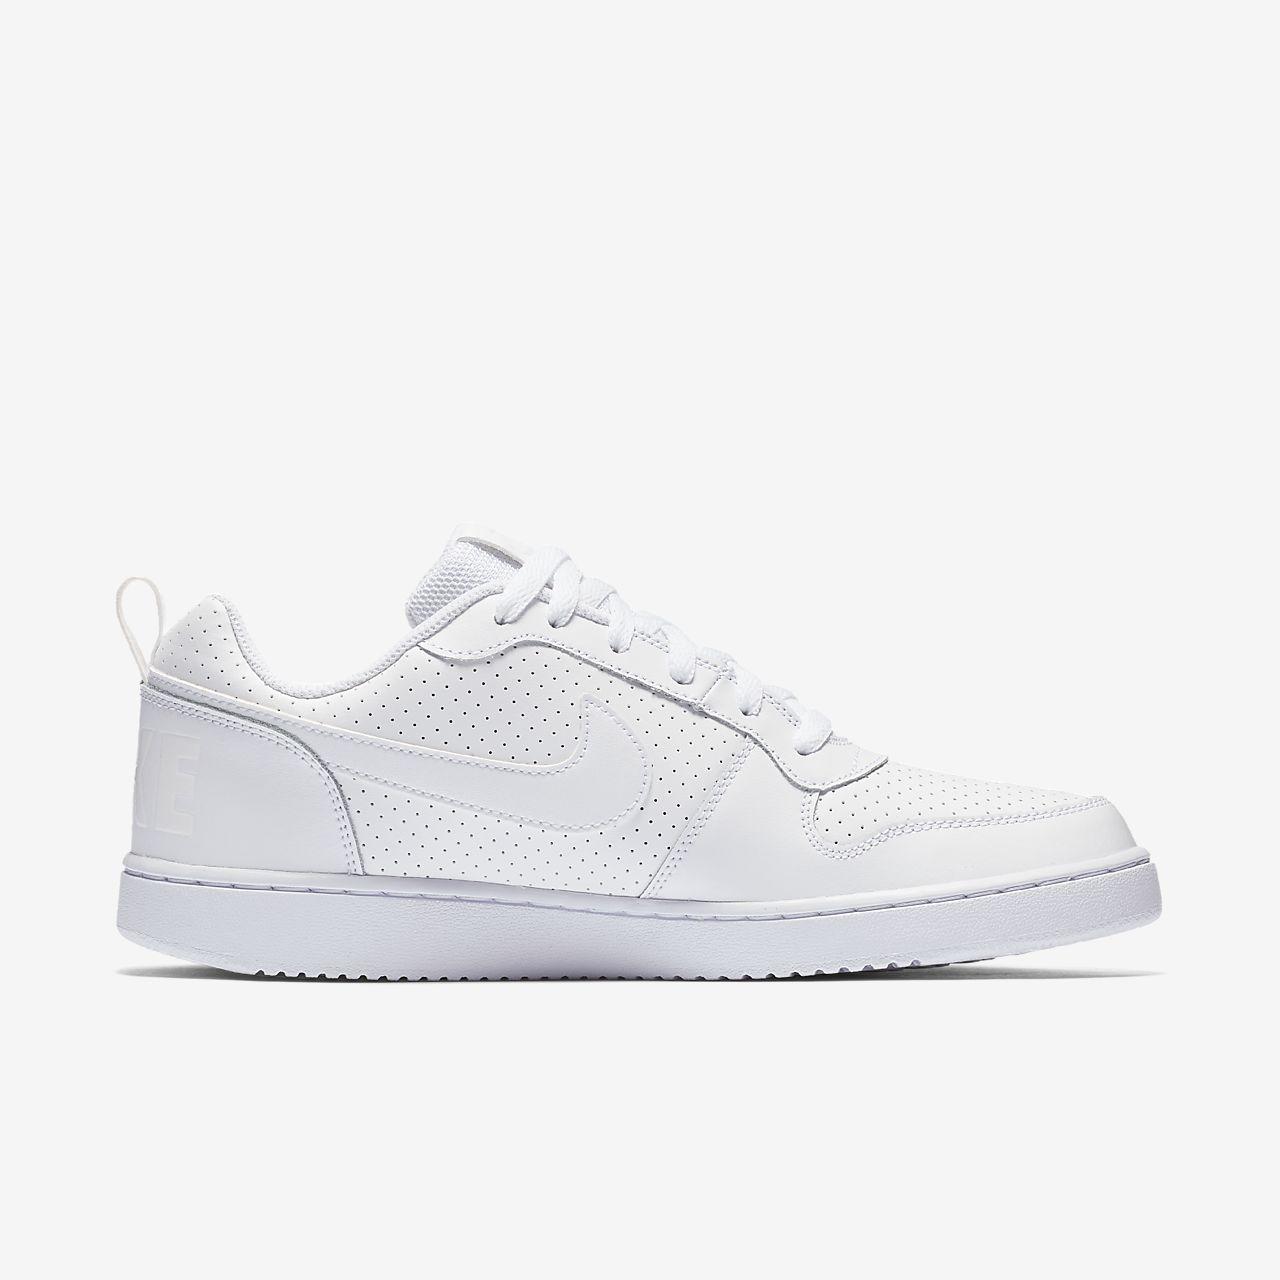 Zapatos grises Nike Court Borough Low para hombre 2sflIQNfL